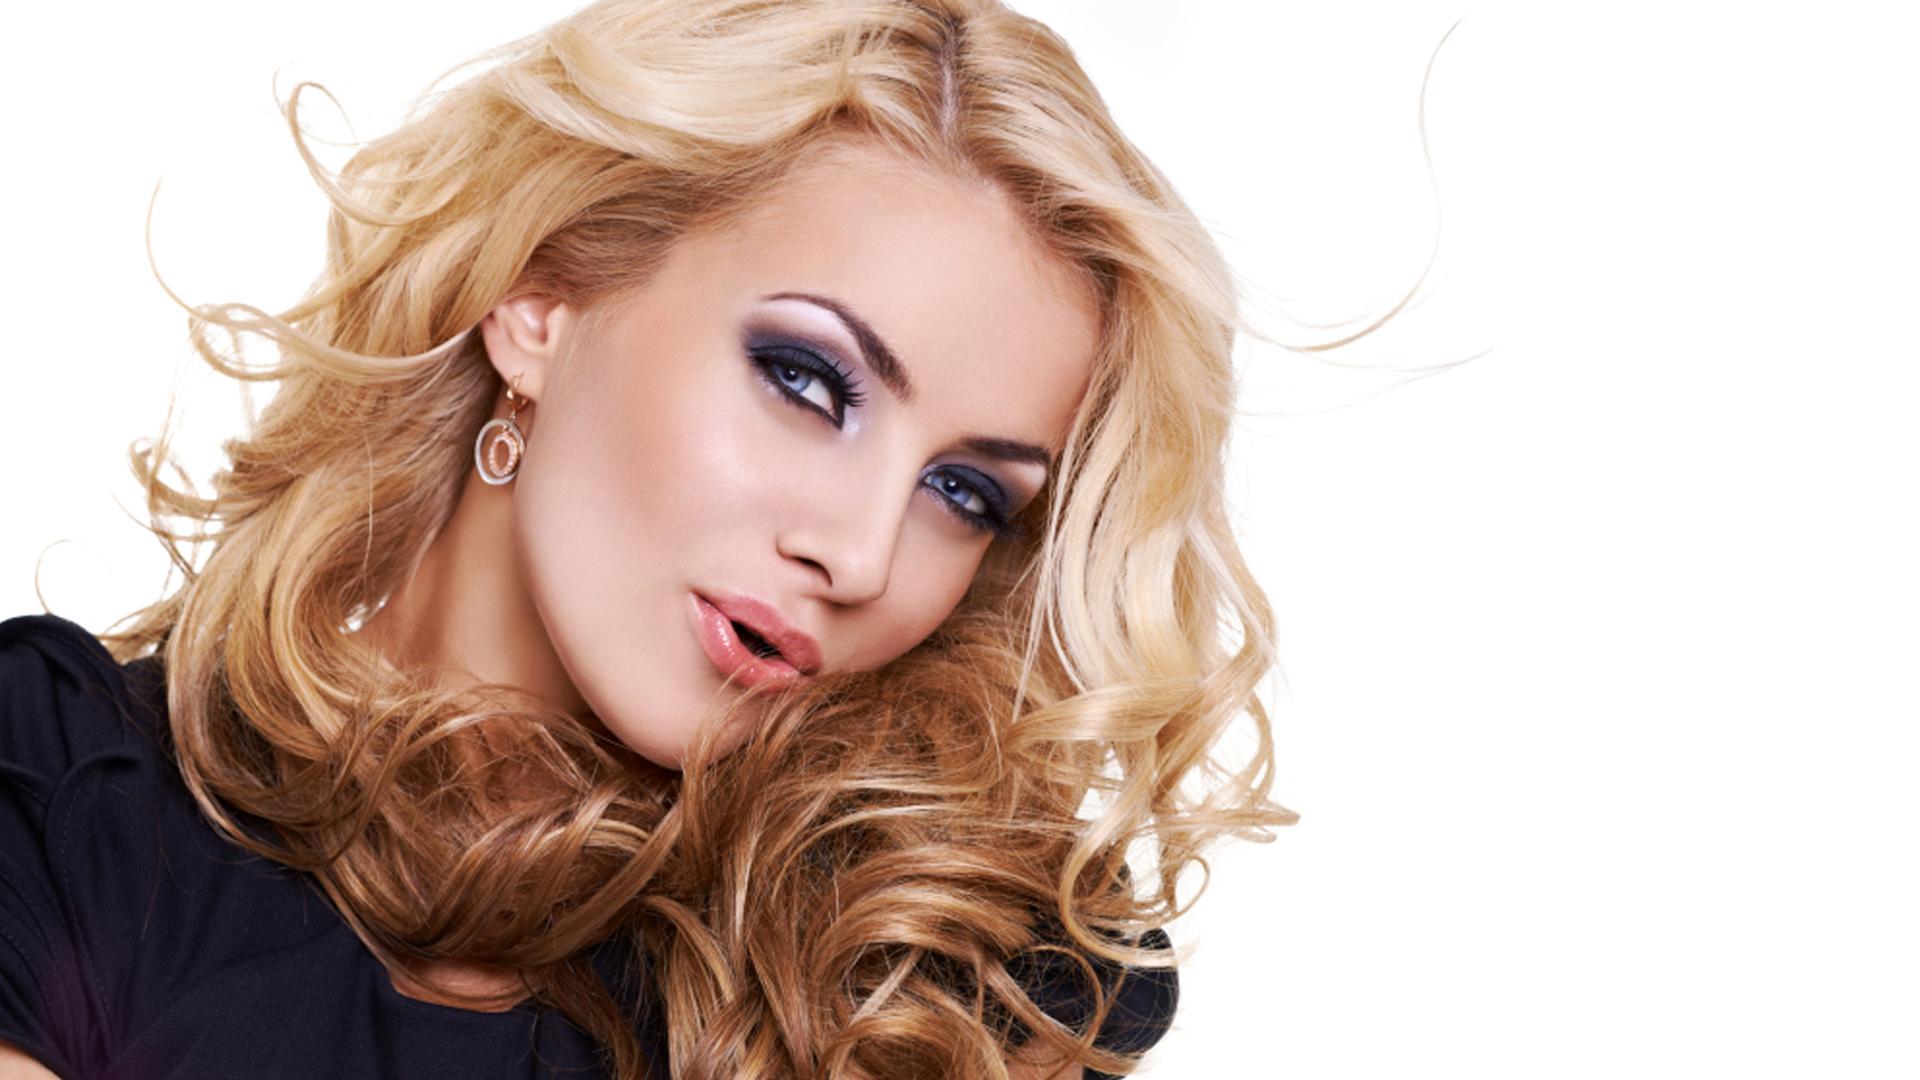 Anthony Jones Hair Salons Hair Style Selection 1066